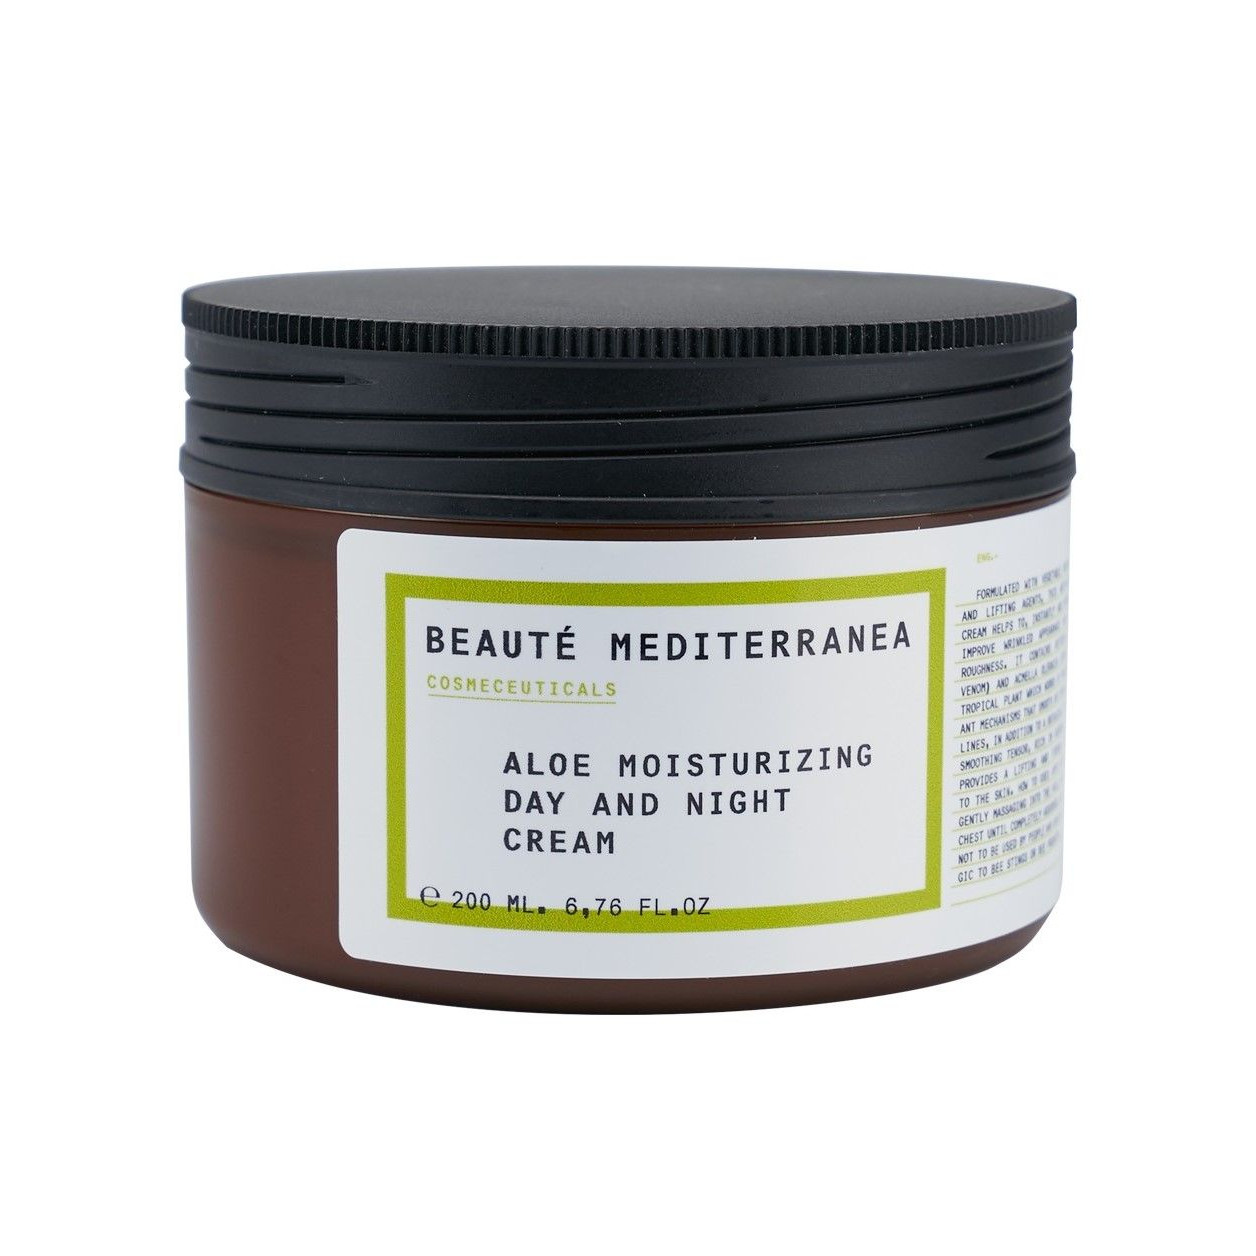 Aloe Moisturizing Day and Night Cream